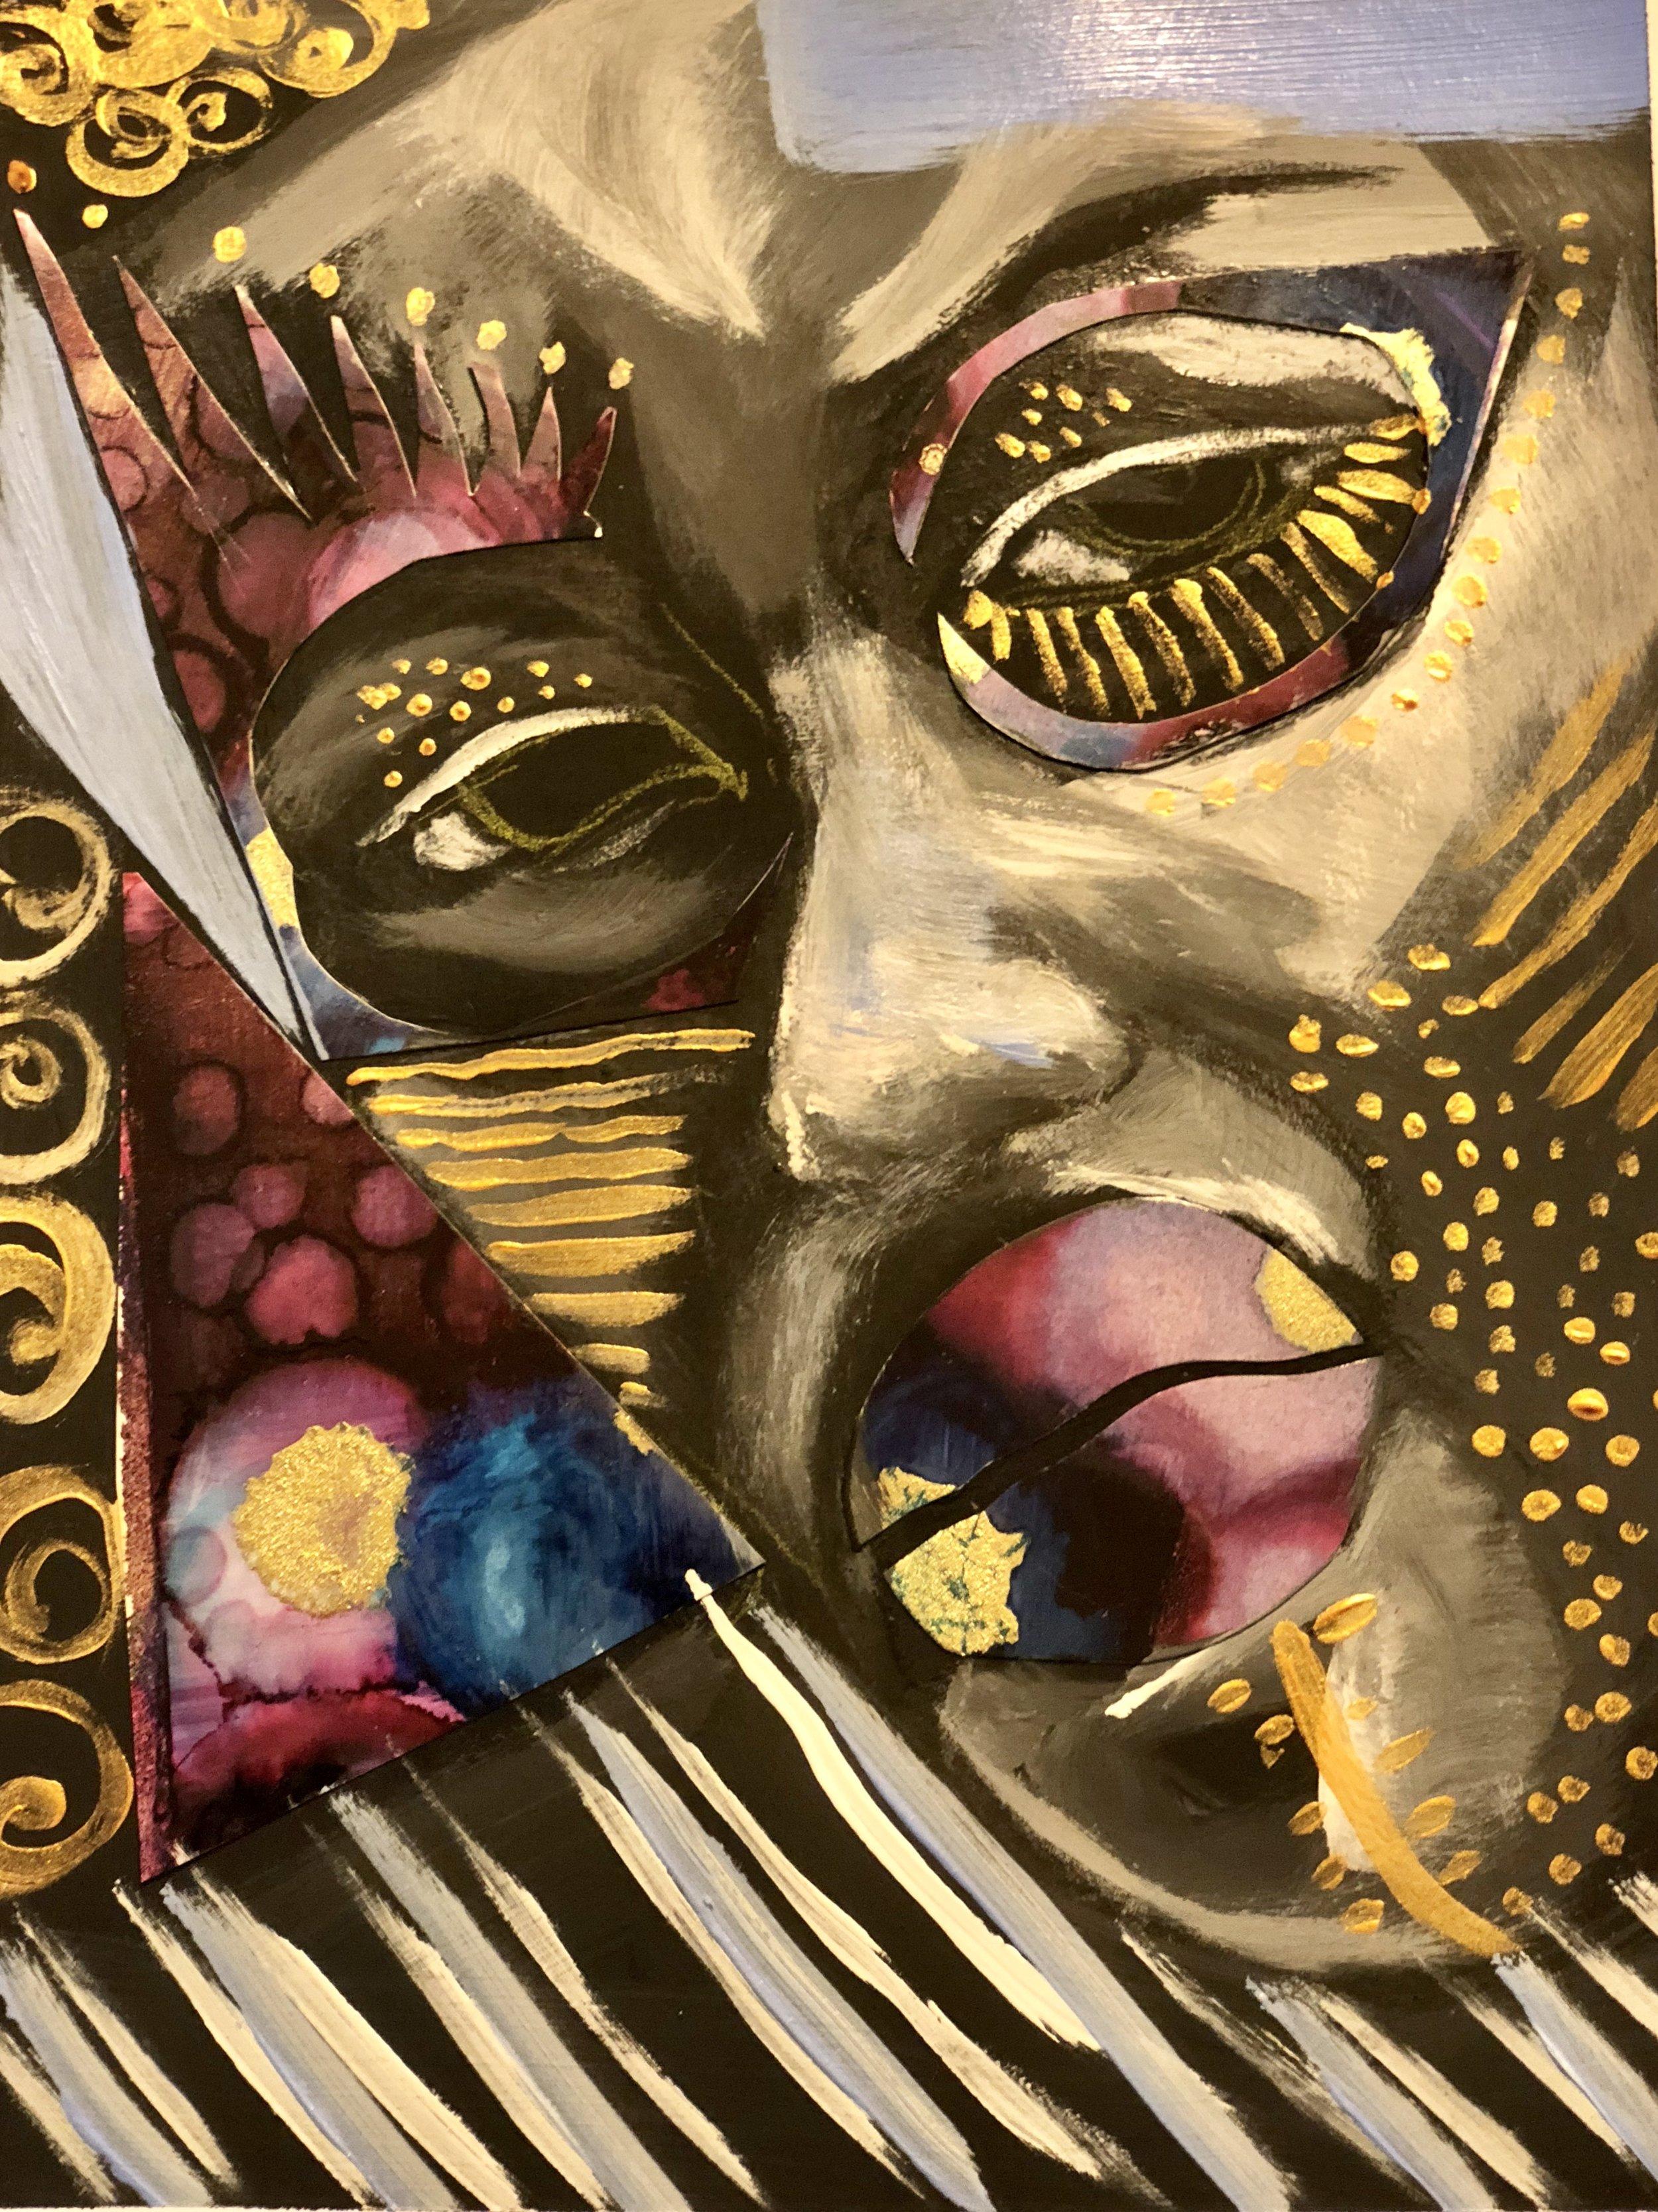 Hombre   Acrylic, mixed media on paper  9.5 x 11   $200